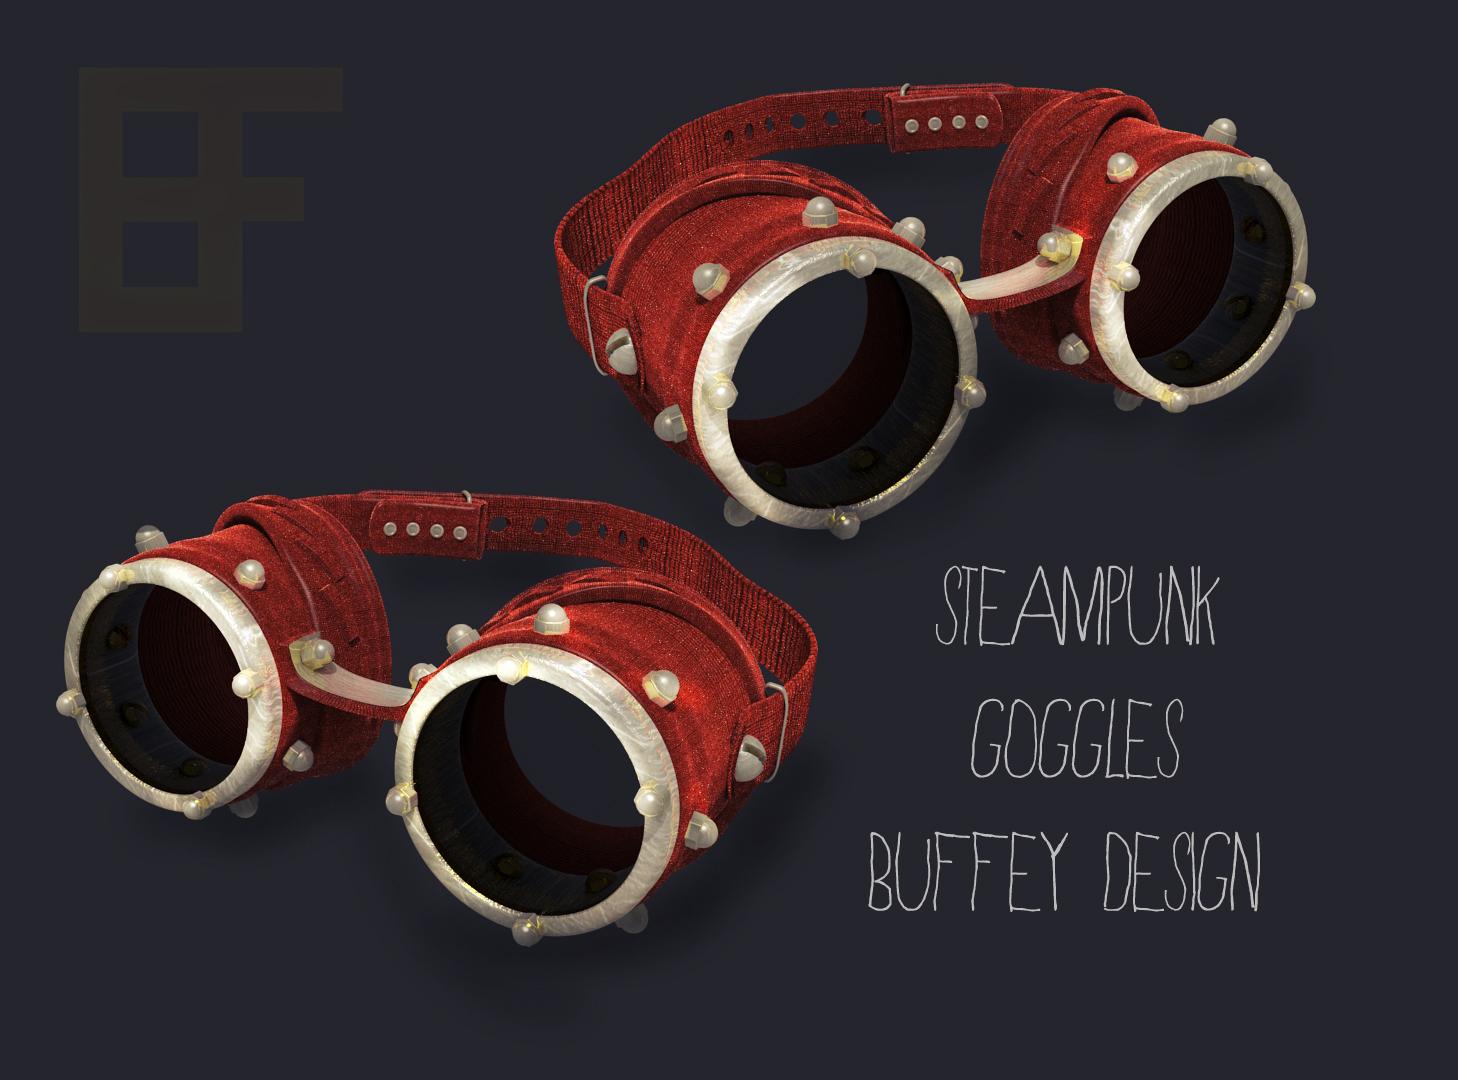 http://fc05.deviantart.net/fs71/f/2012/038/9/b/steampunk_goggles_by_djbuffey-d4oz9xe.jpg